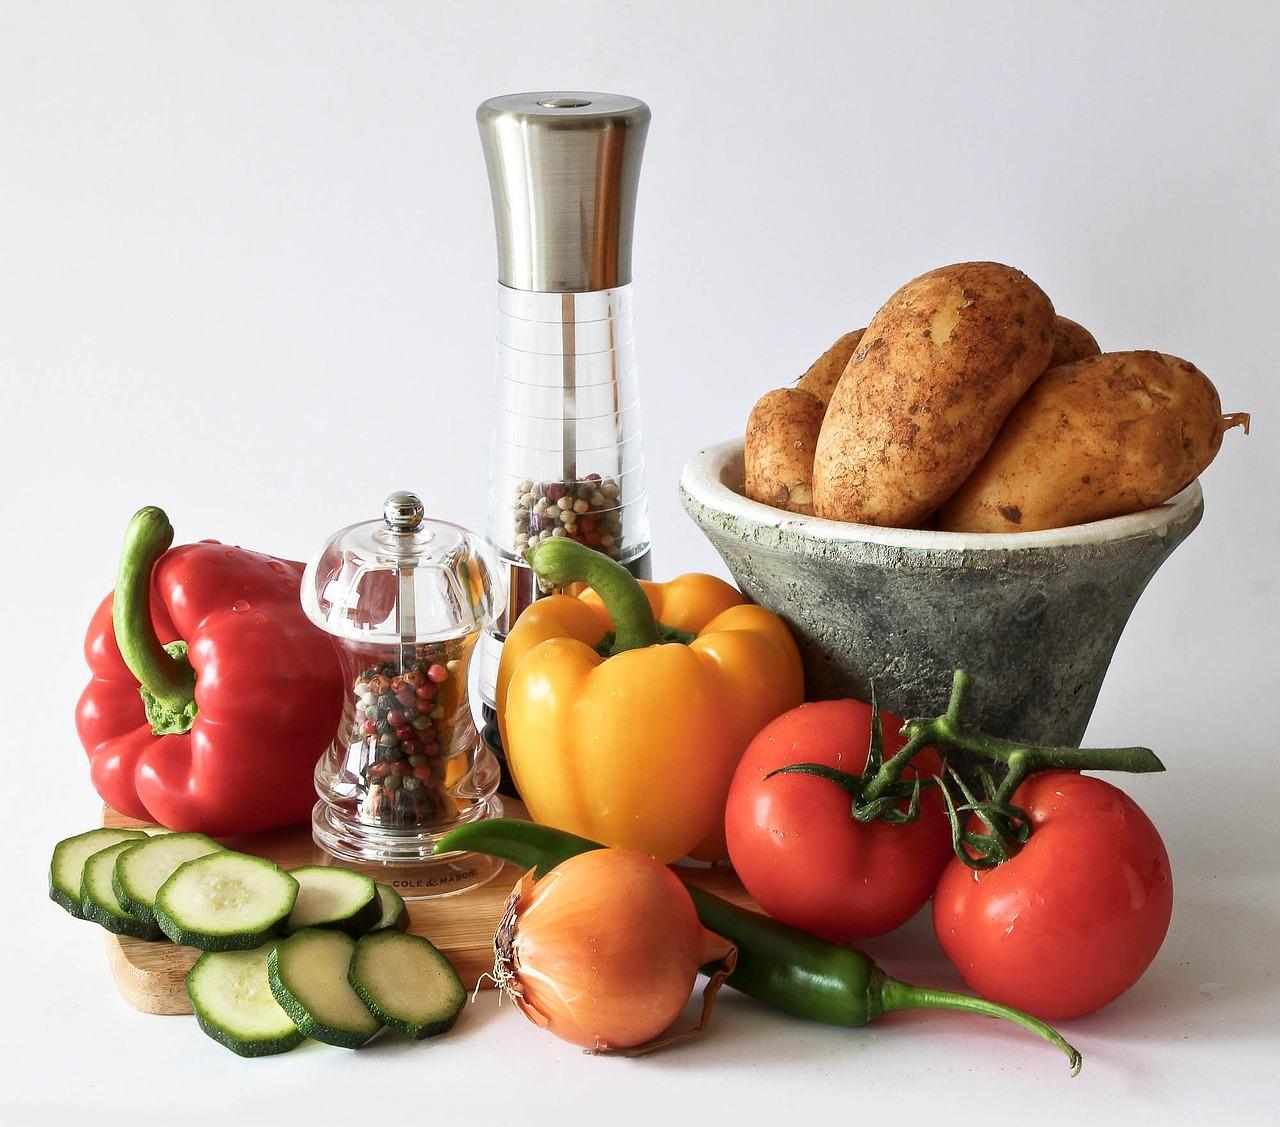 vegetarische kochkurse kochkurse kulinarisches. Black Bedroom Furniture Sets. Home Design Ideas